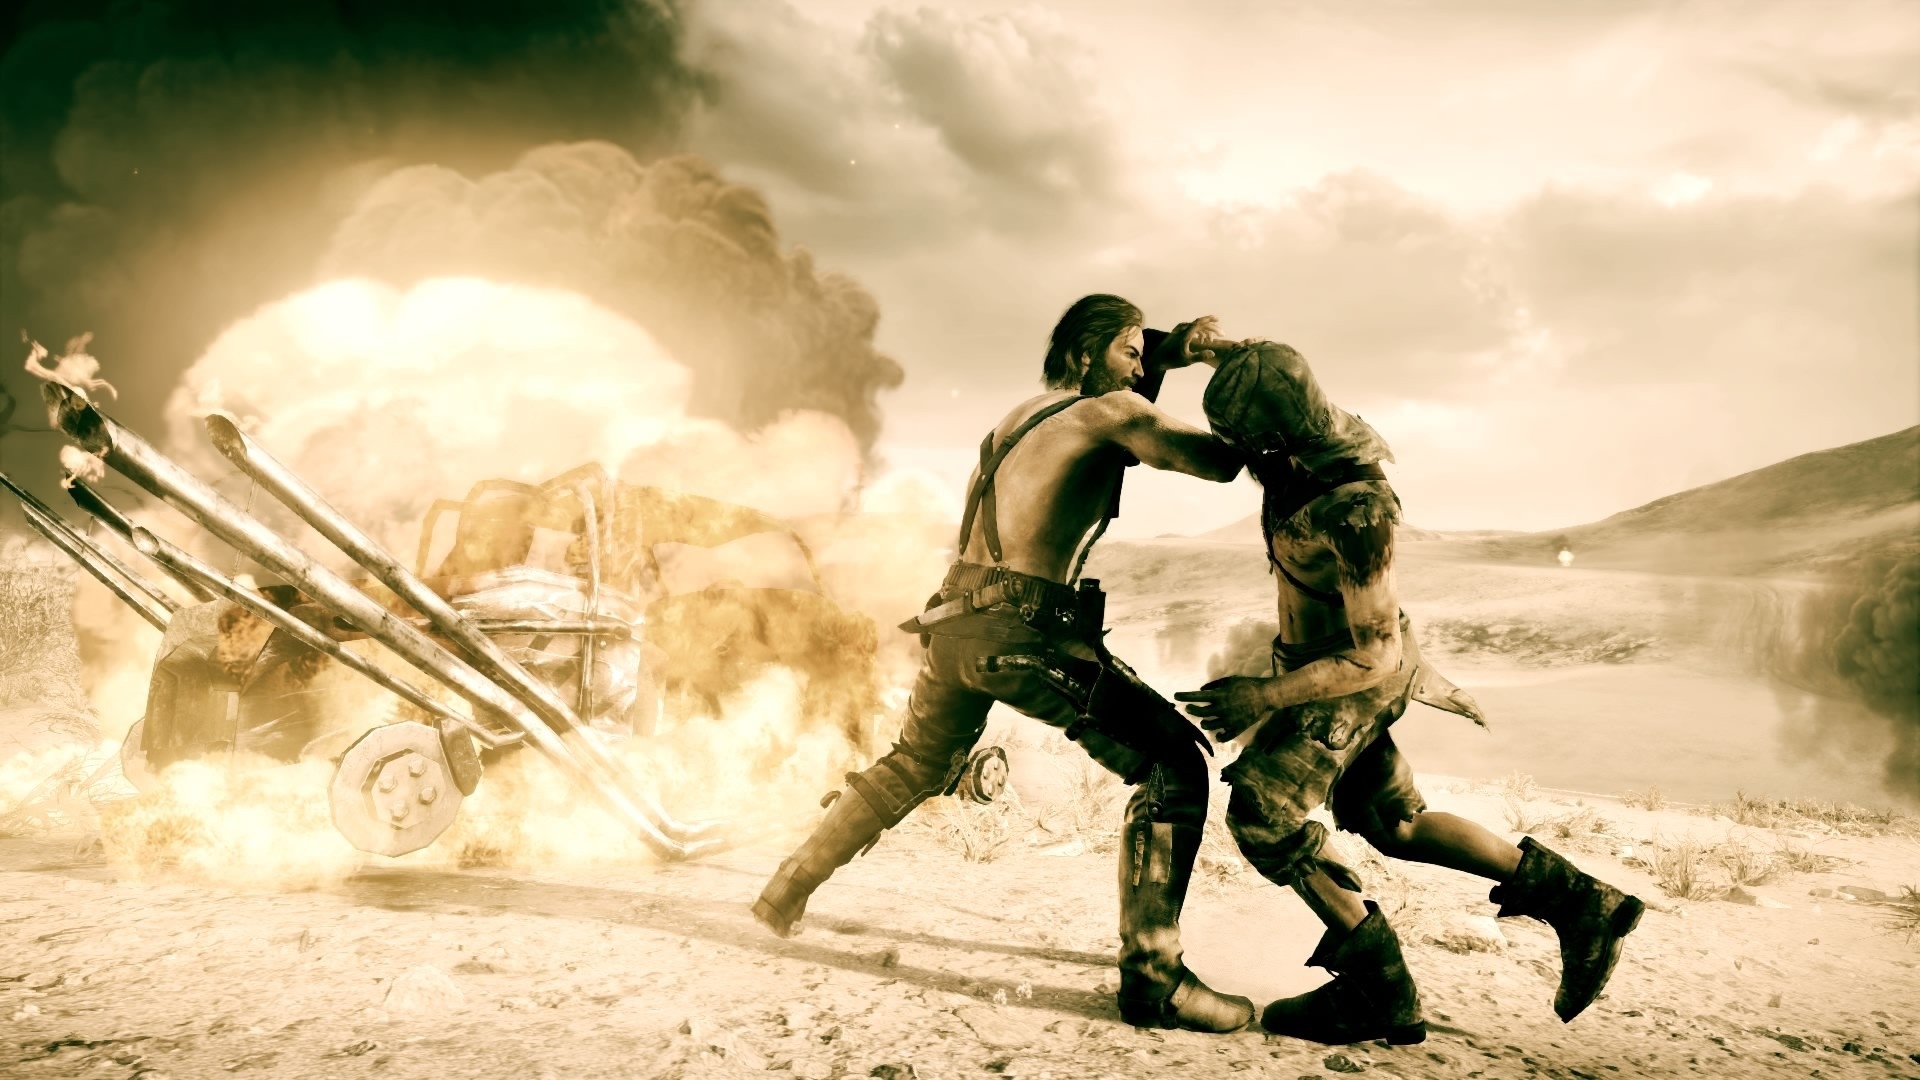 Mad Max The Wasteland Kinostart